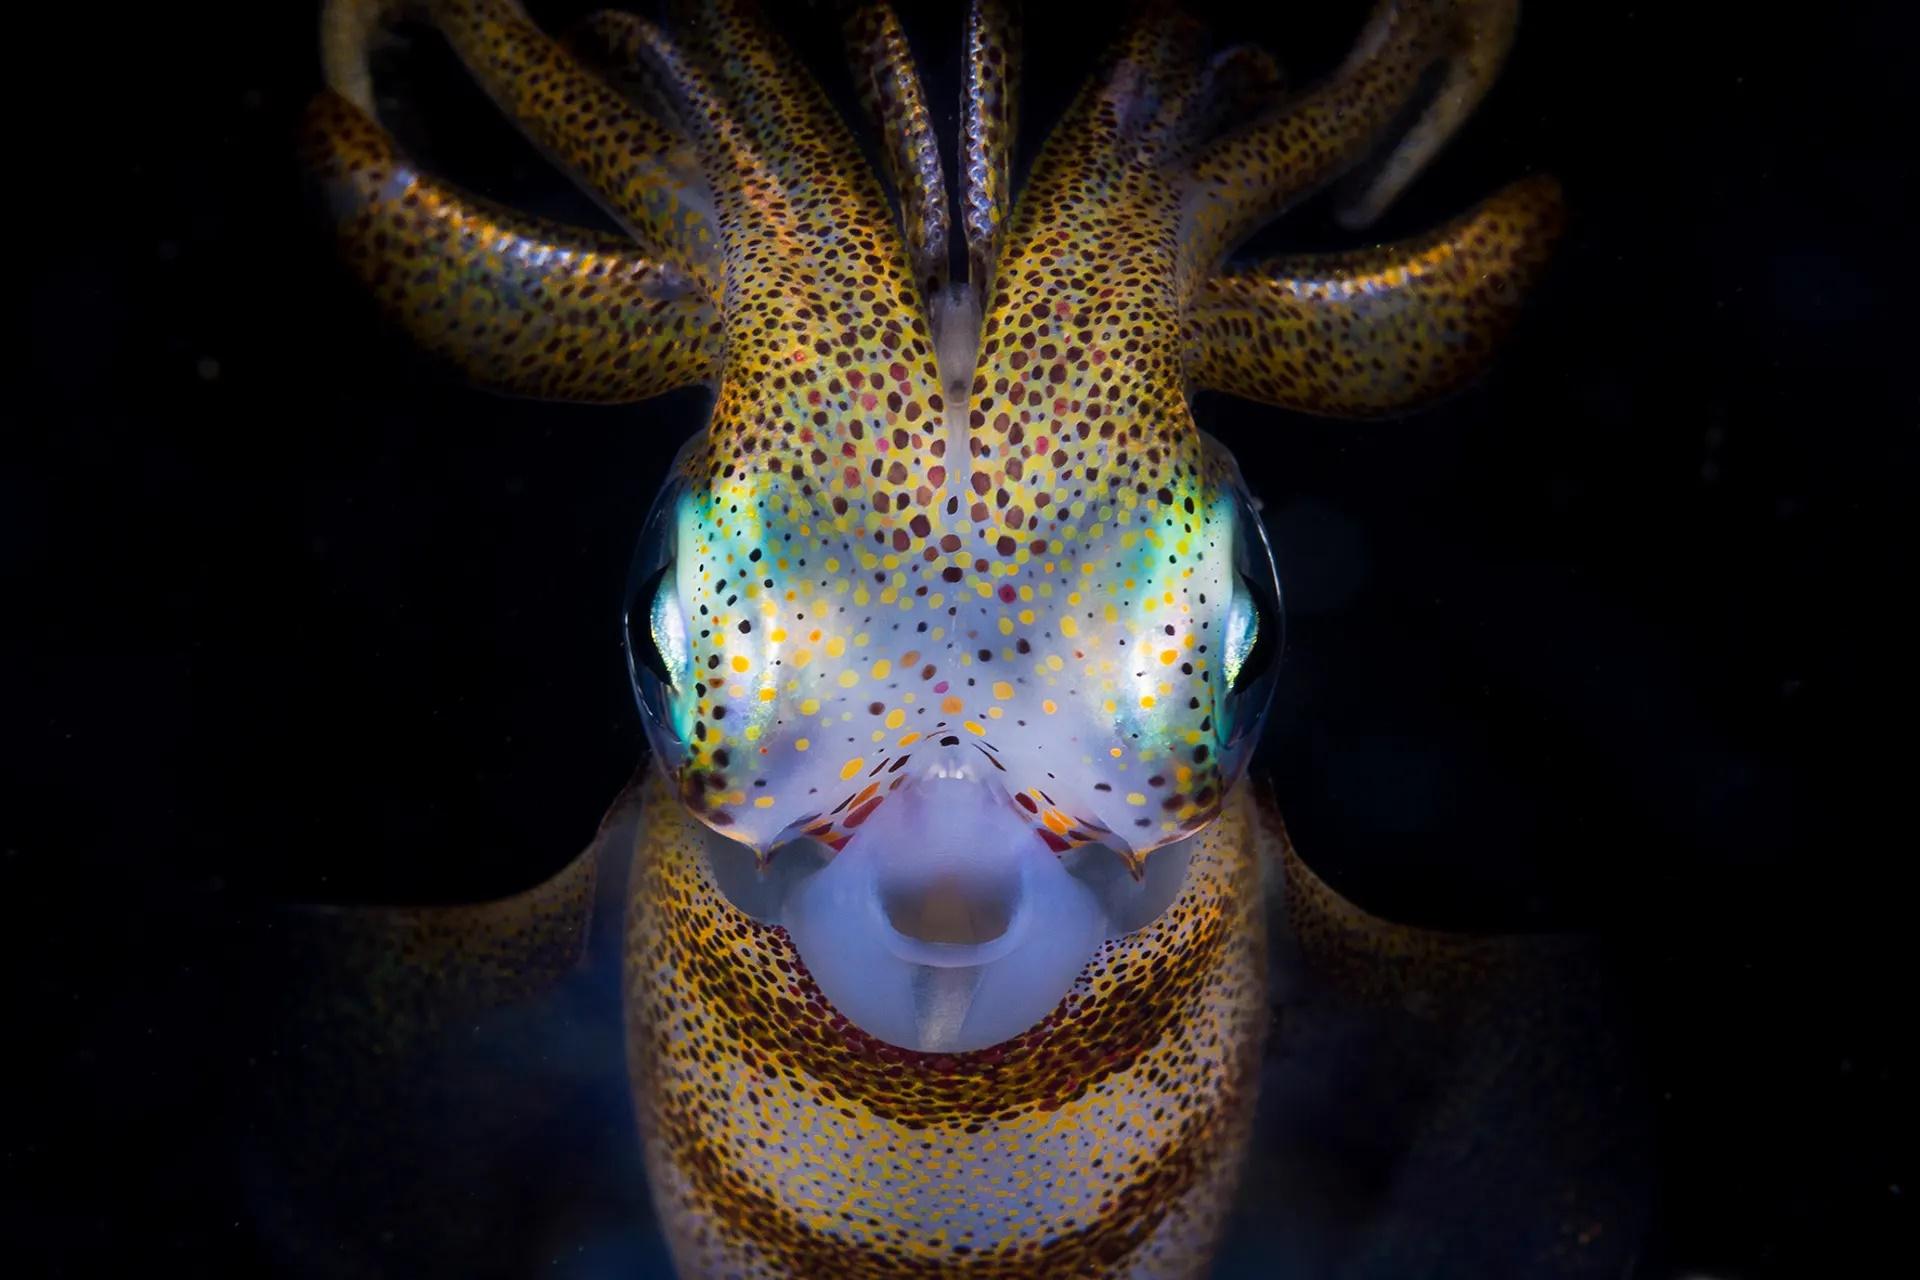 Tην τρίτη θέση στην κατηγορία «Εξερευνητής Φωτογράφος» πήρε η φωτογραφία του καλαμαριού Sepioteuthis australis σε μια θαλάσσια περιοχή της Νέας Νότιας Ουαλίας, στην Αυστραλία